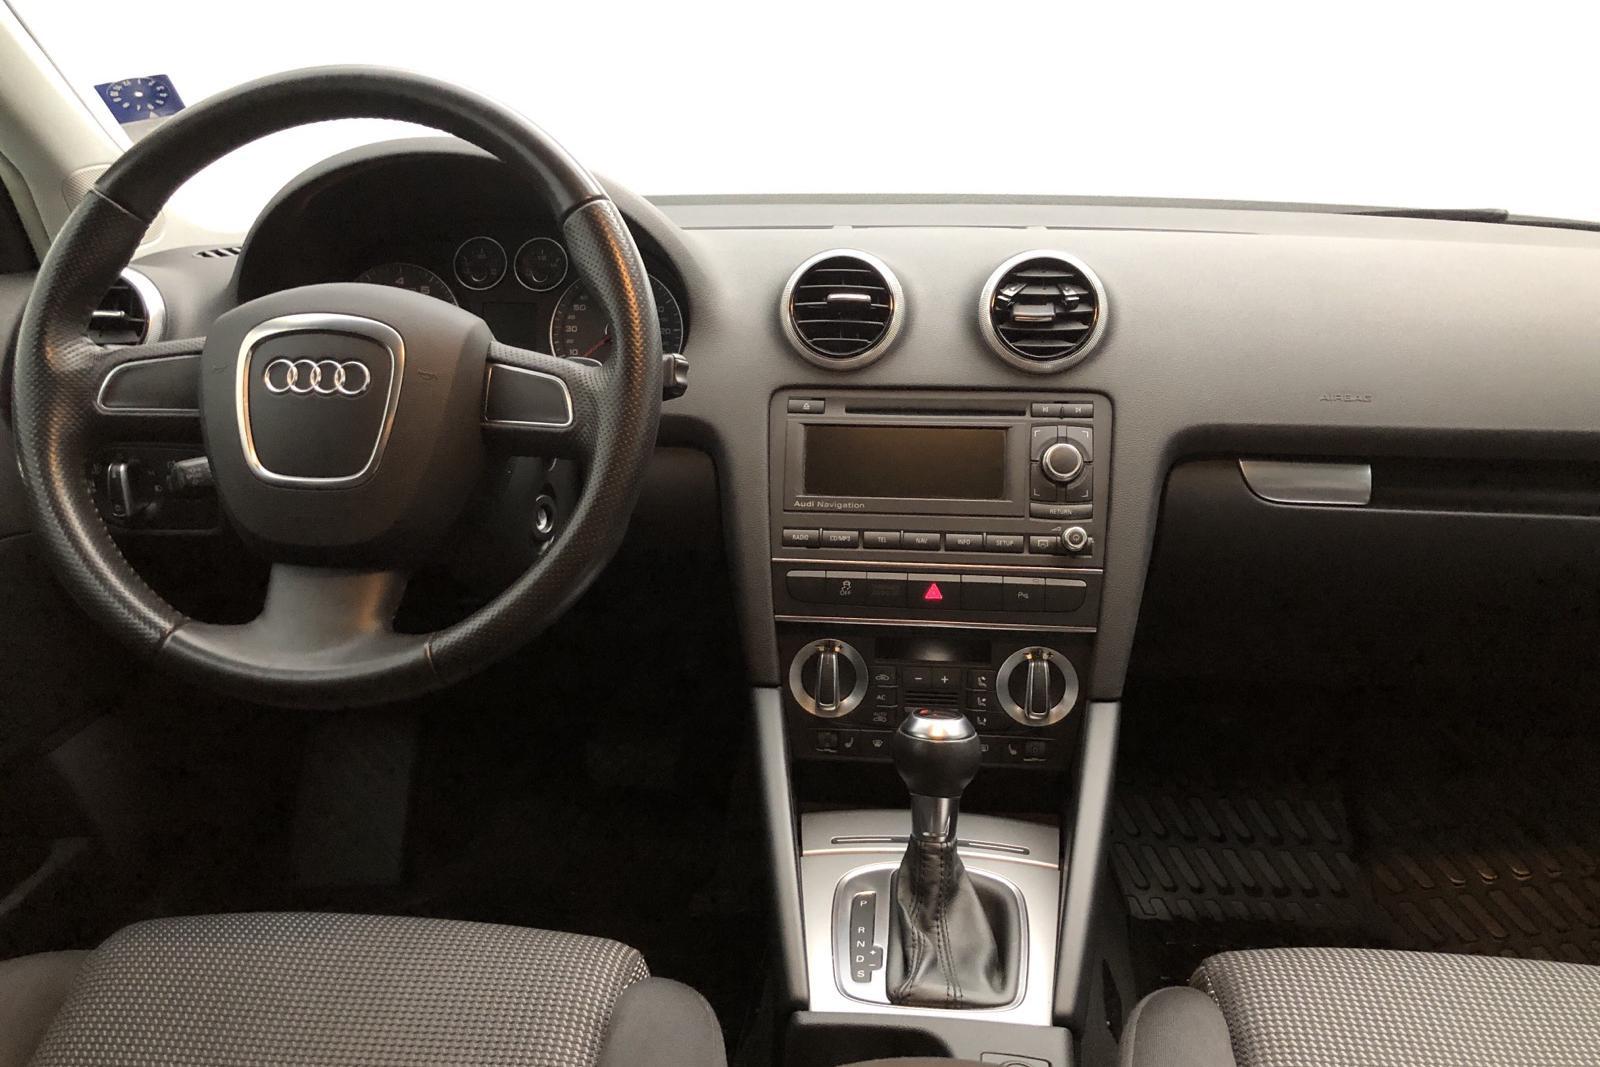 Audi A3 2.0 TFSI Sportback quattro (200hk) - 9 523 mil - Automat - vit - 2012